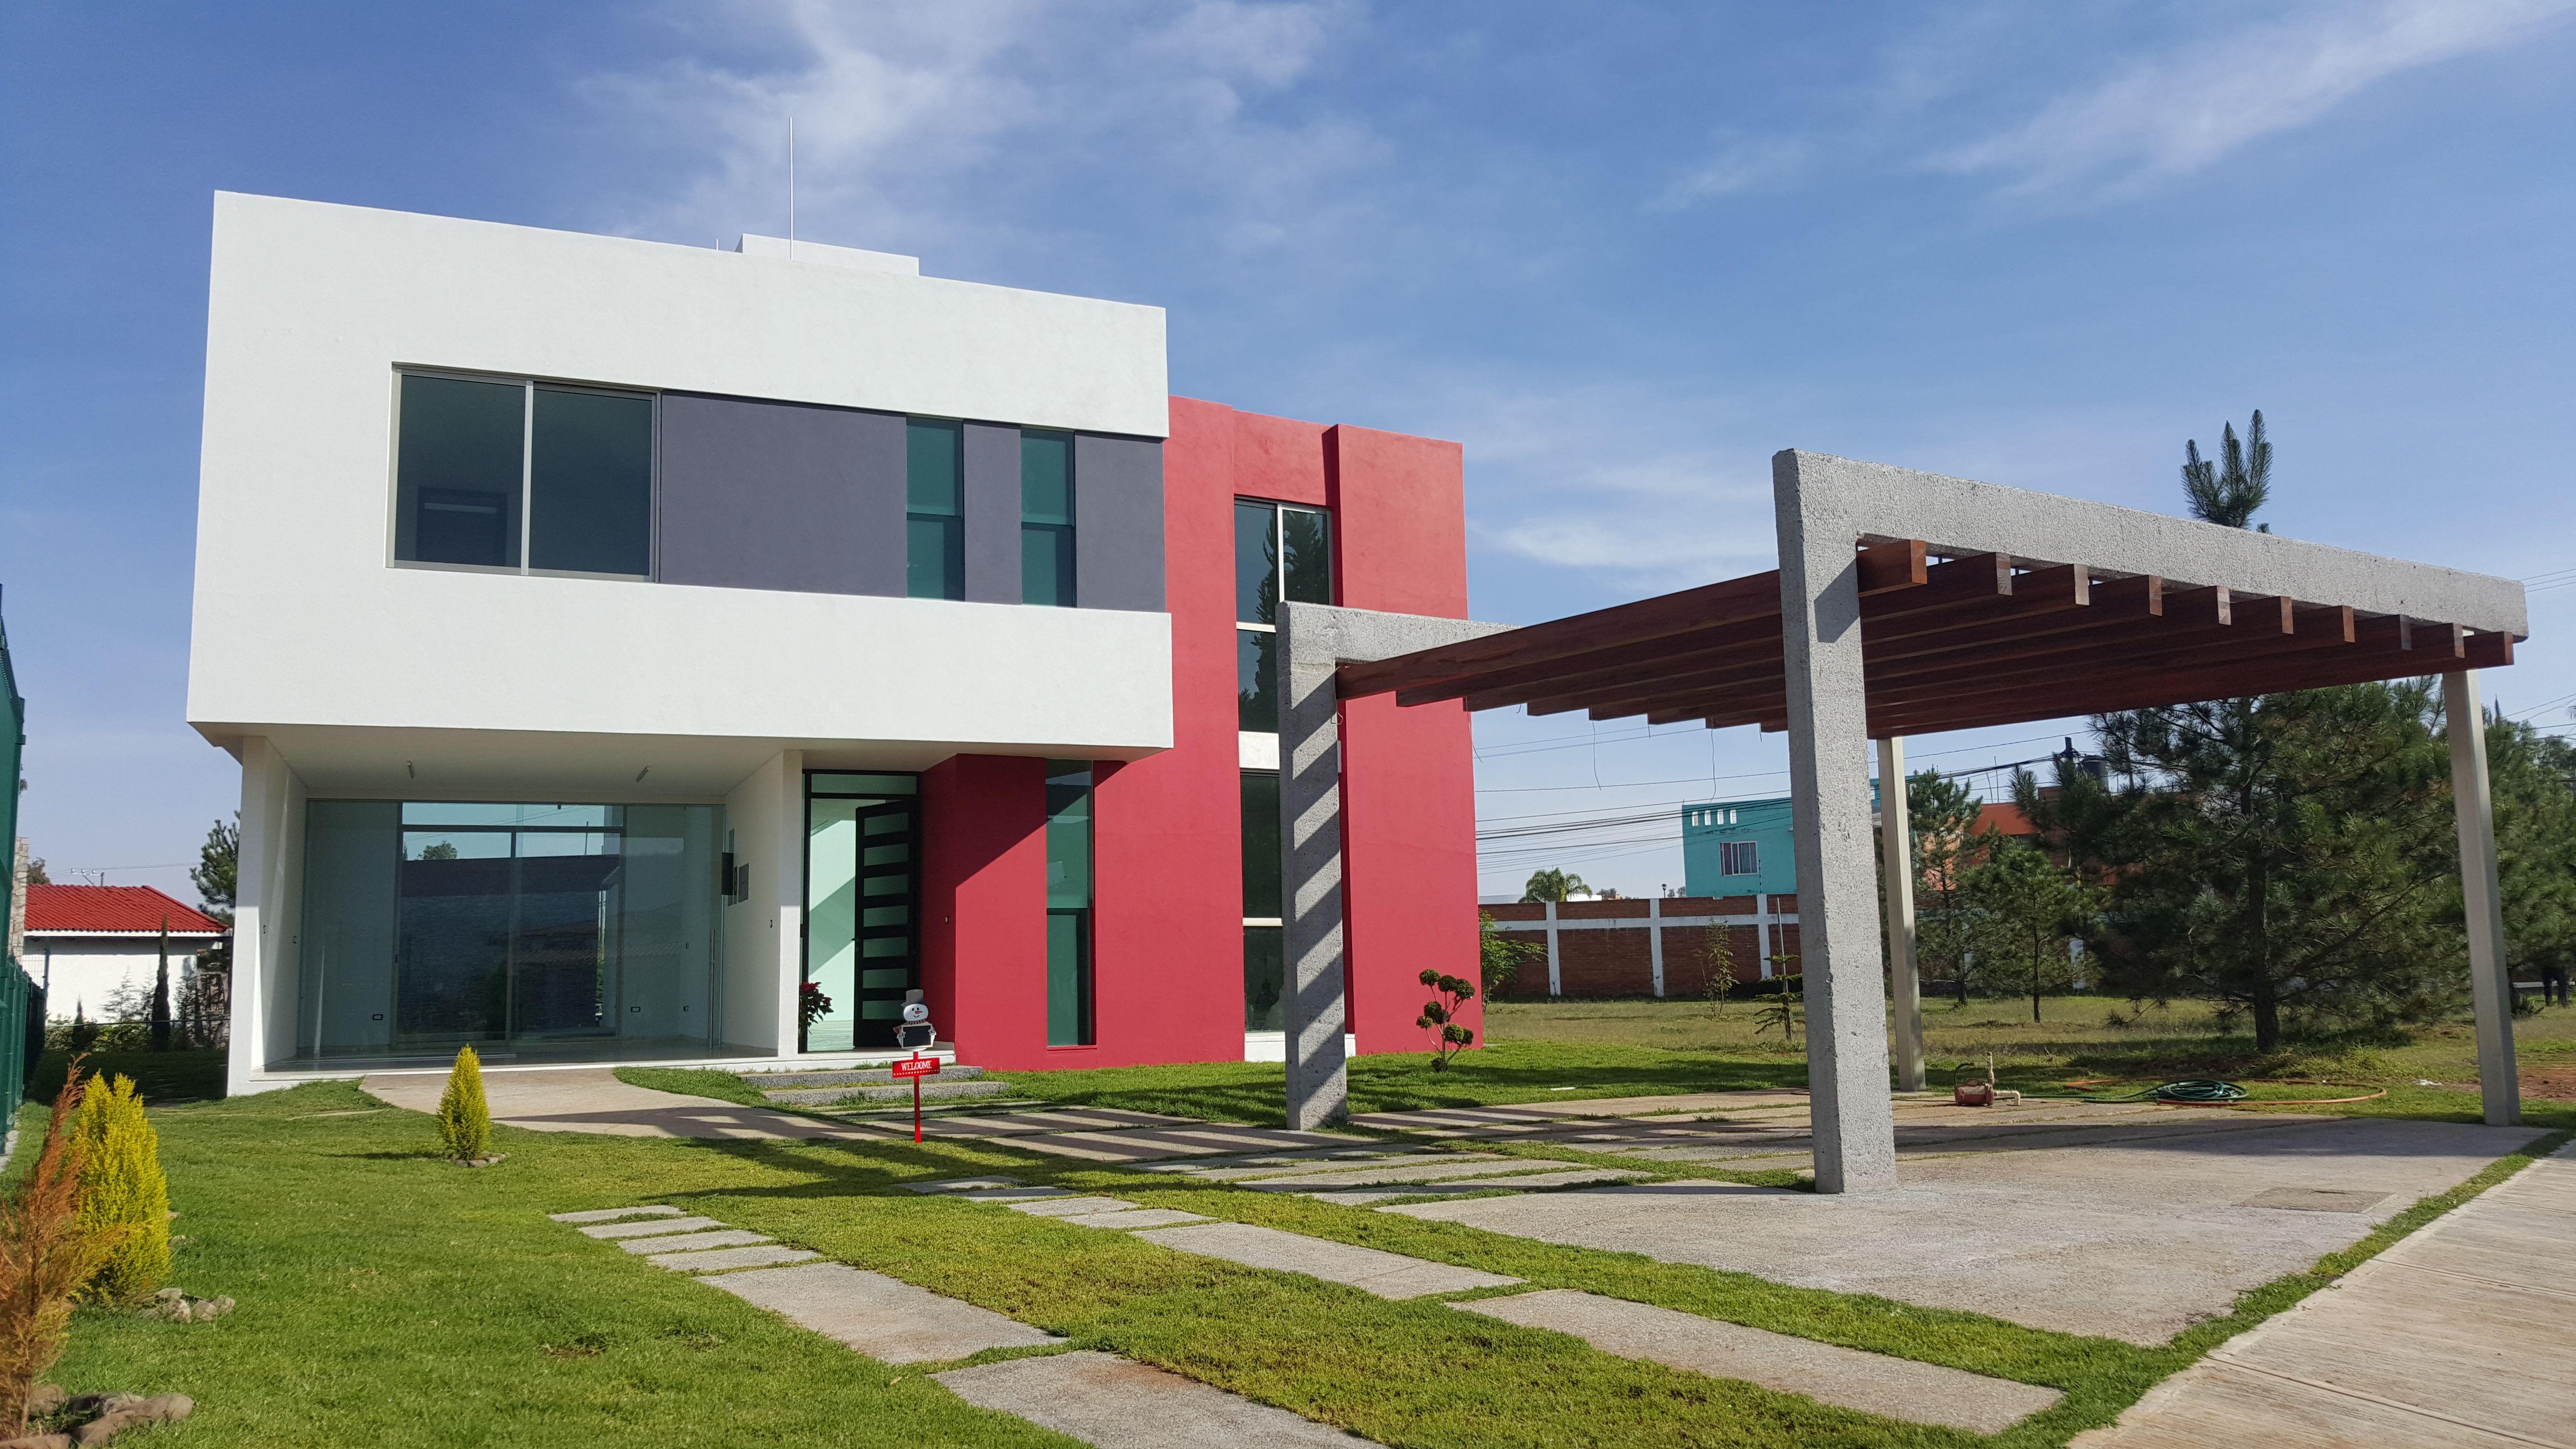 Fachada rojo blanco madera concreto pergolas casa zavala for Casa minimalista rojo